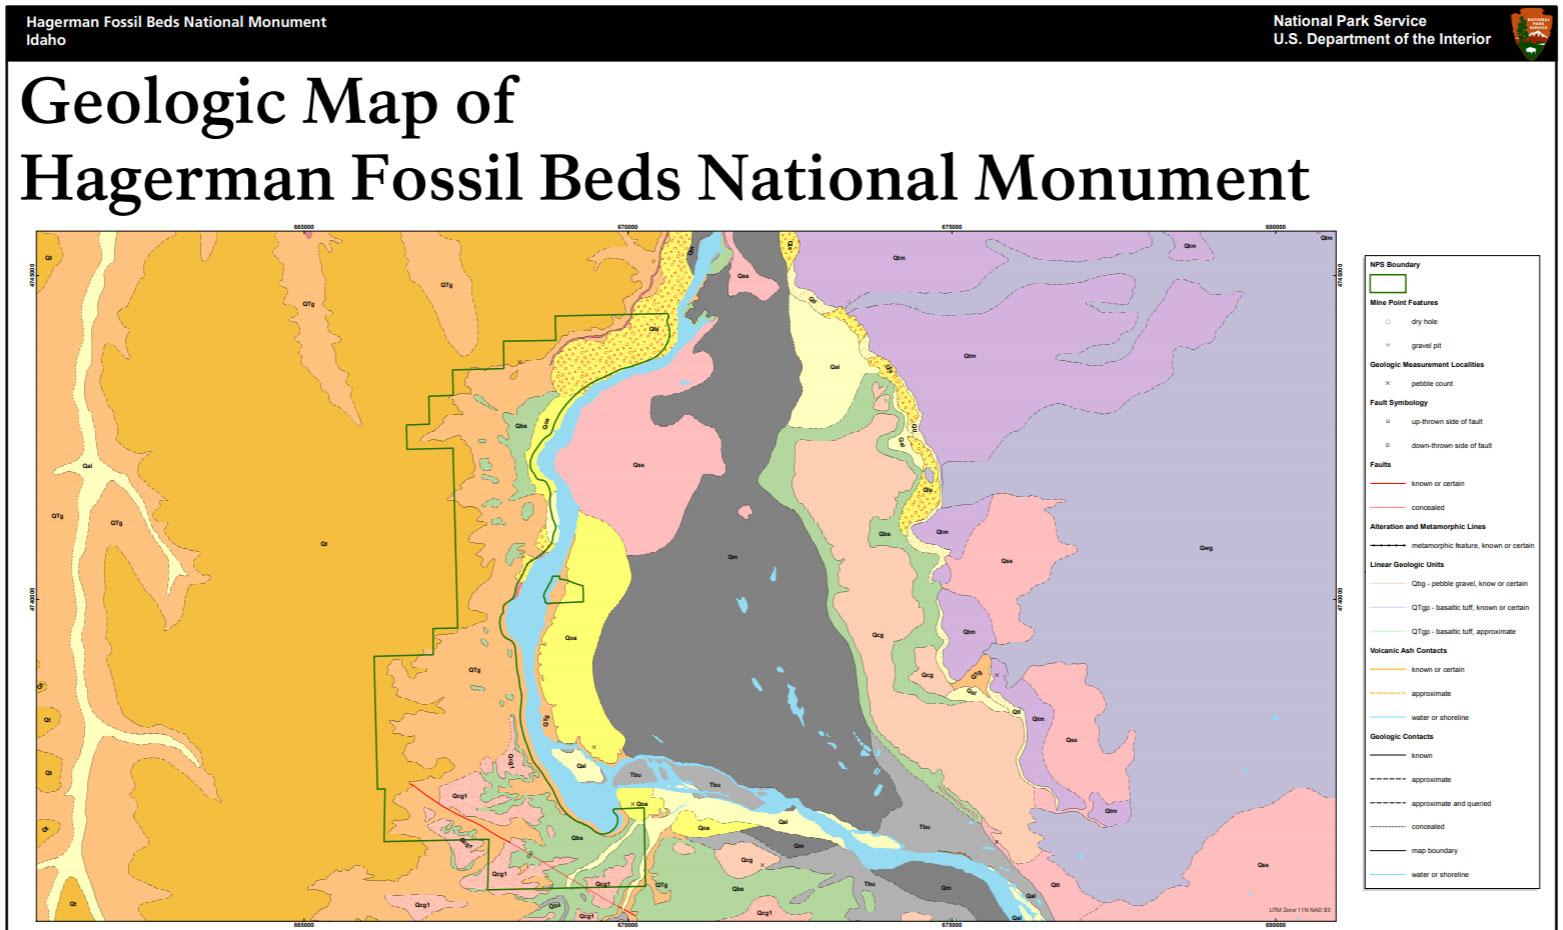 Hagerman Idaho Map.Nps Geodiversity Atlas Hagerman Fossil Beds National Monument Idaho